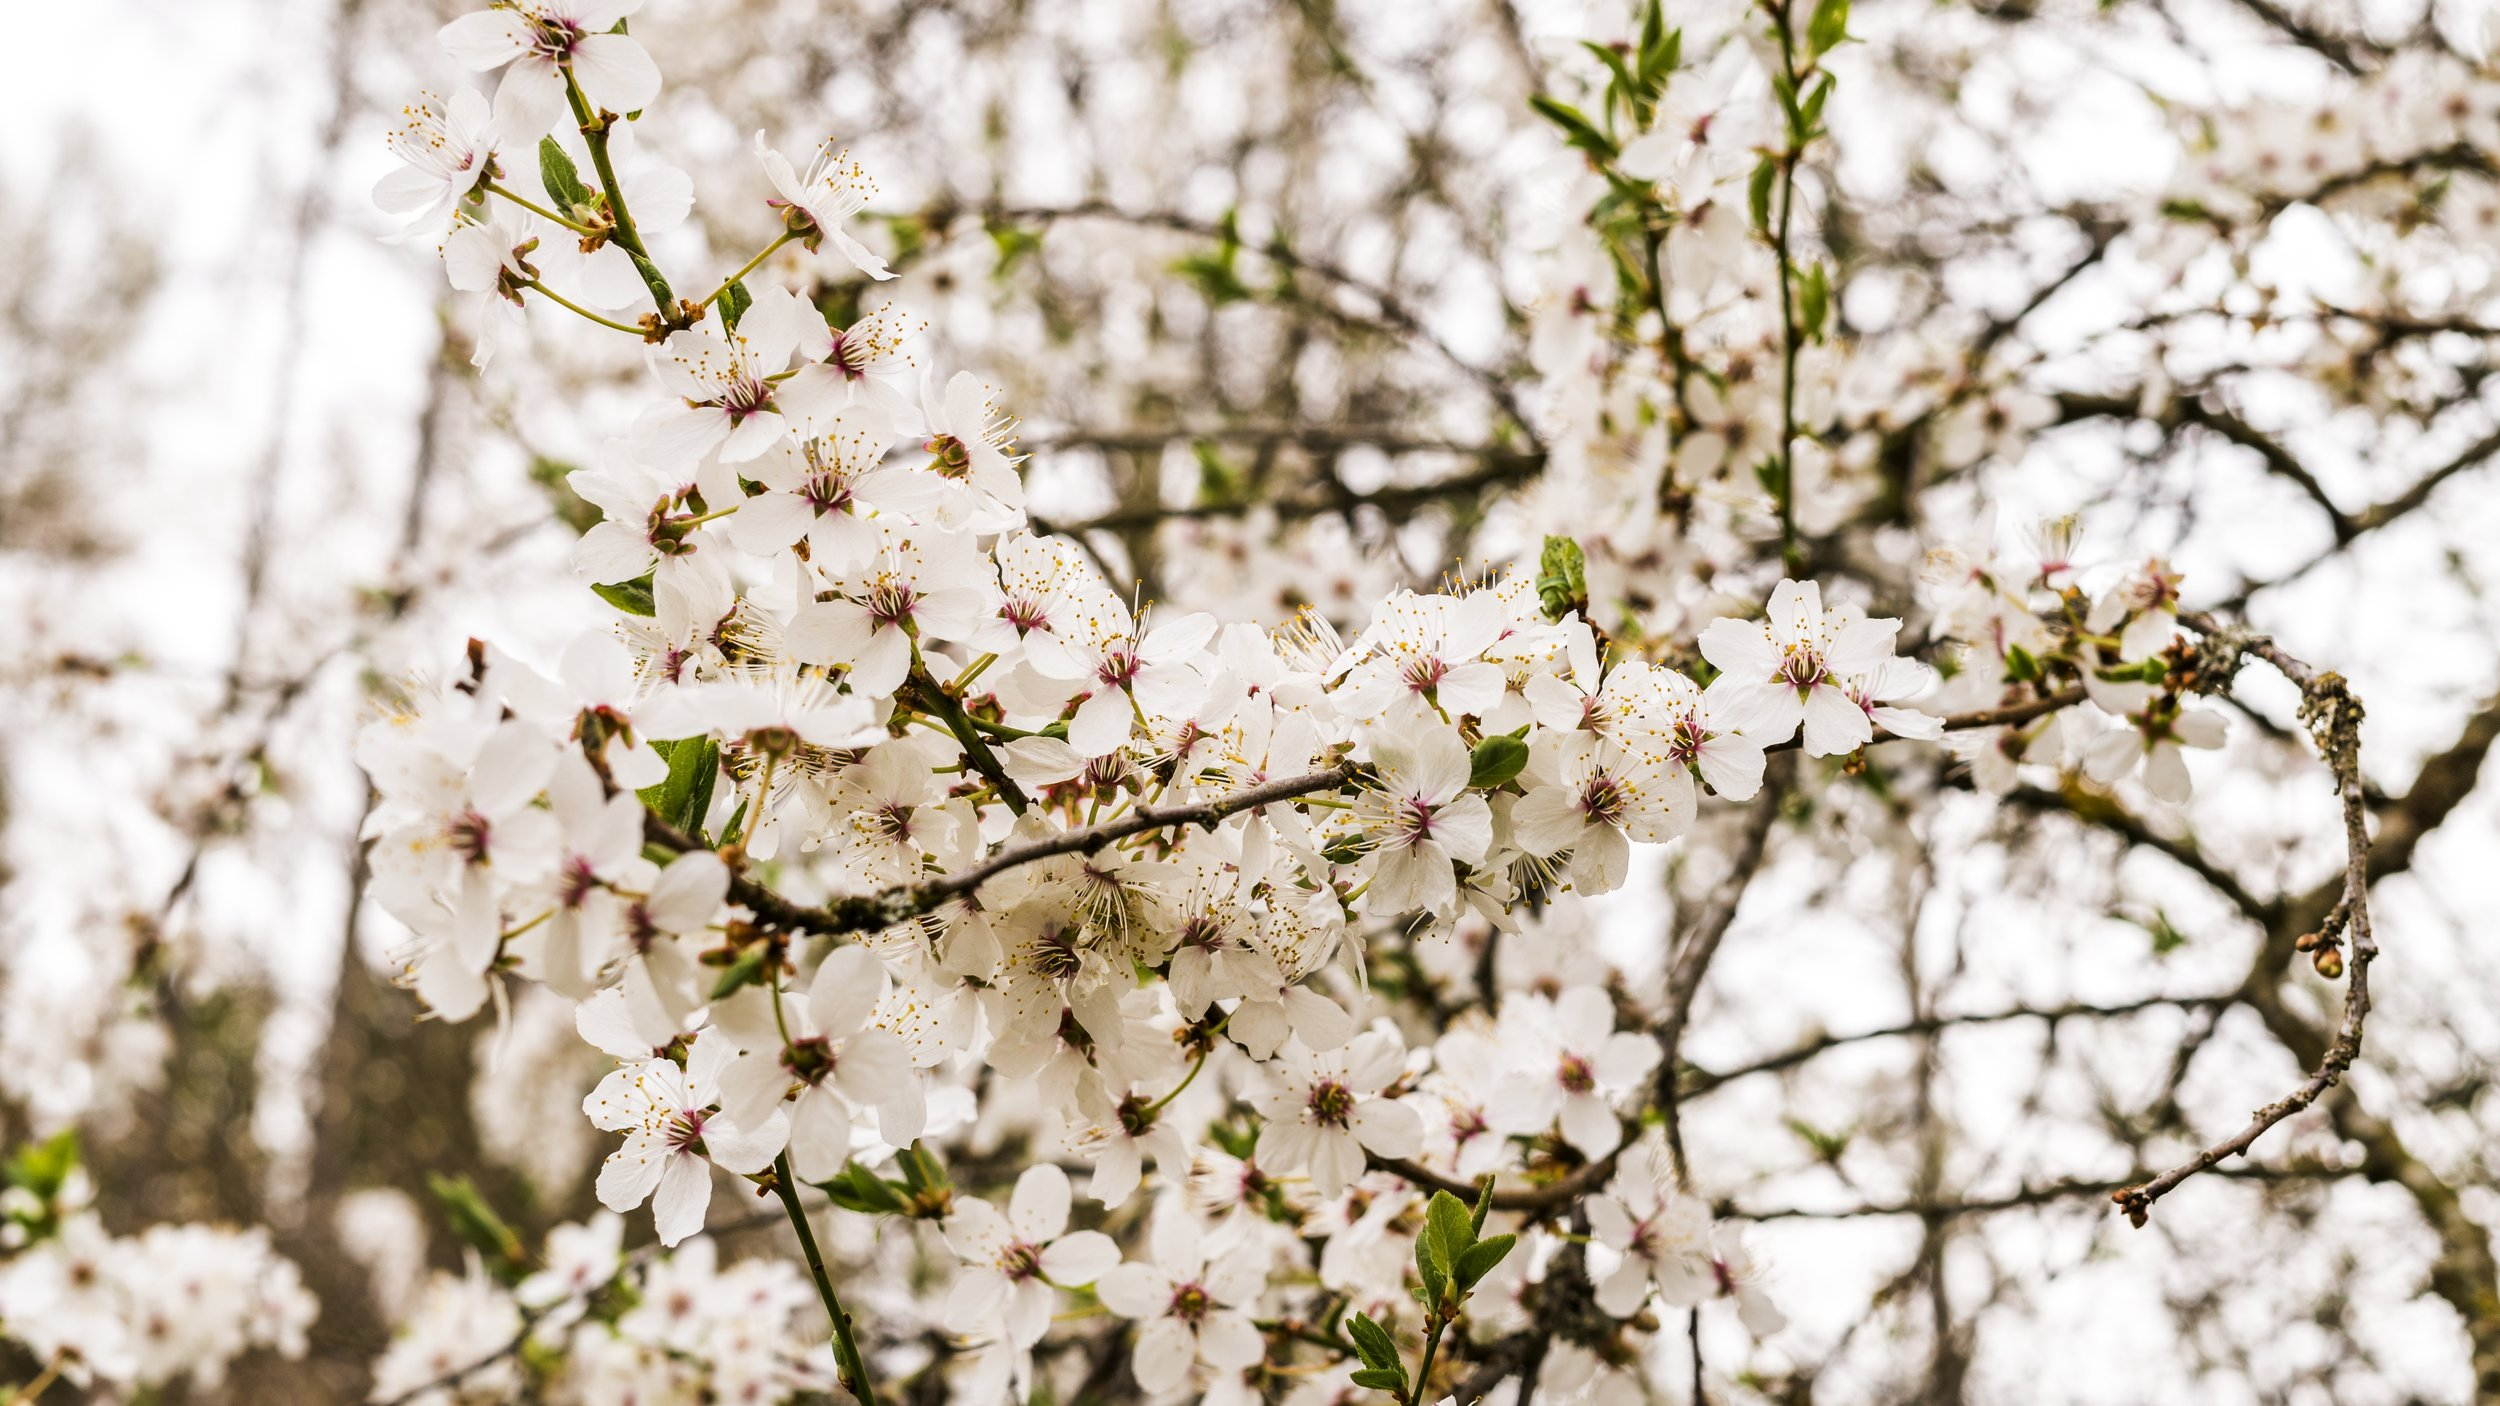 blossom-flower-spring-branch-pink-cherry-blossom-1438473-pxhere.com.jpg